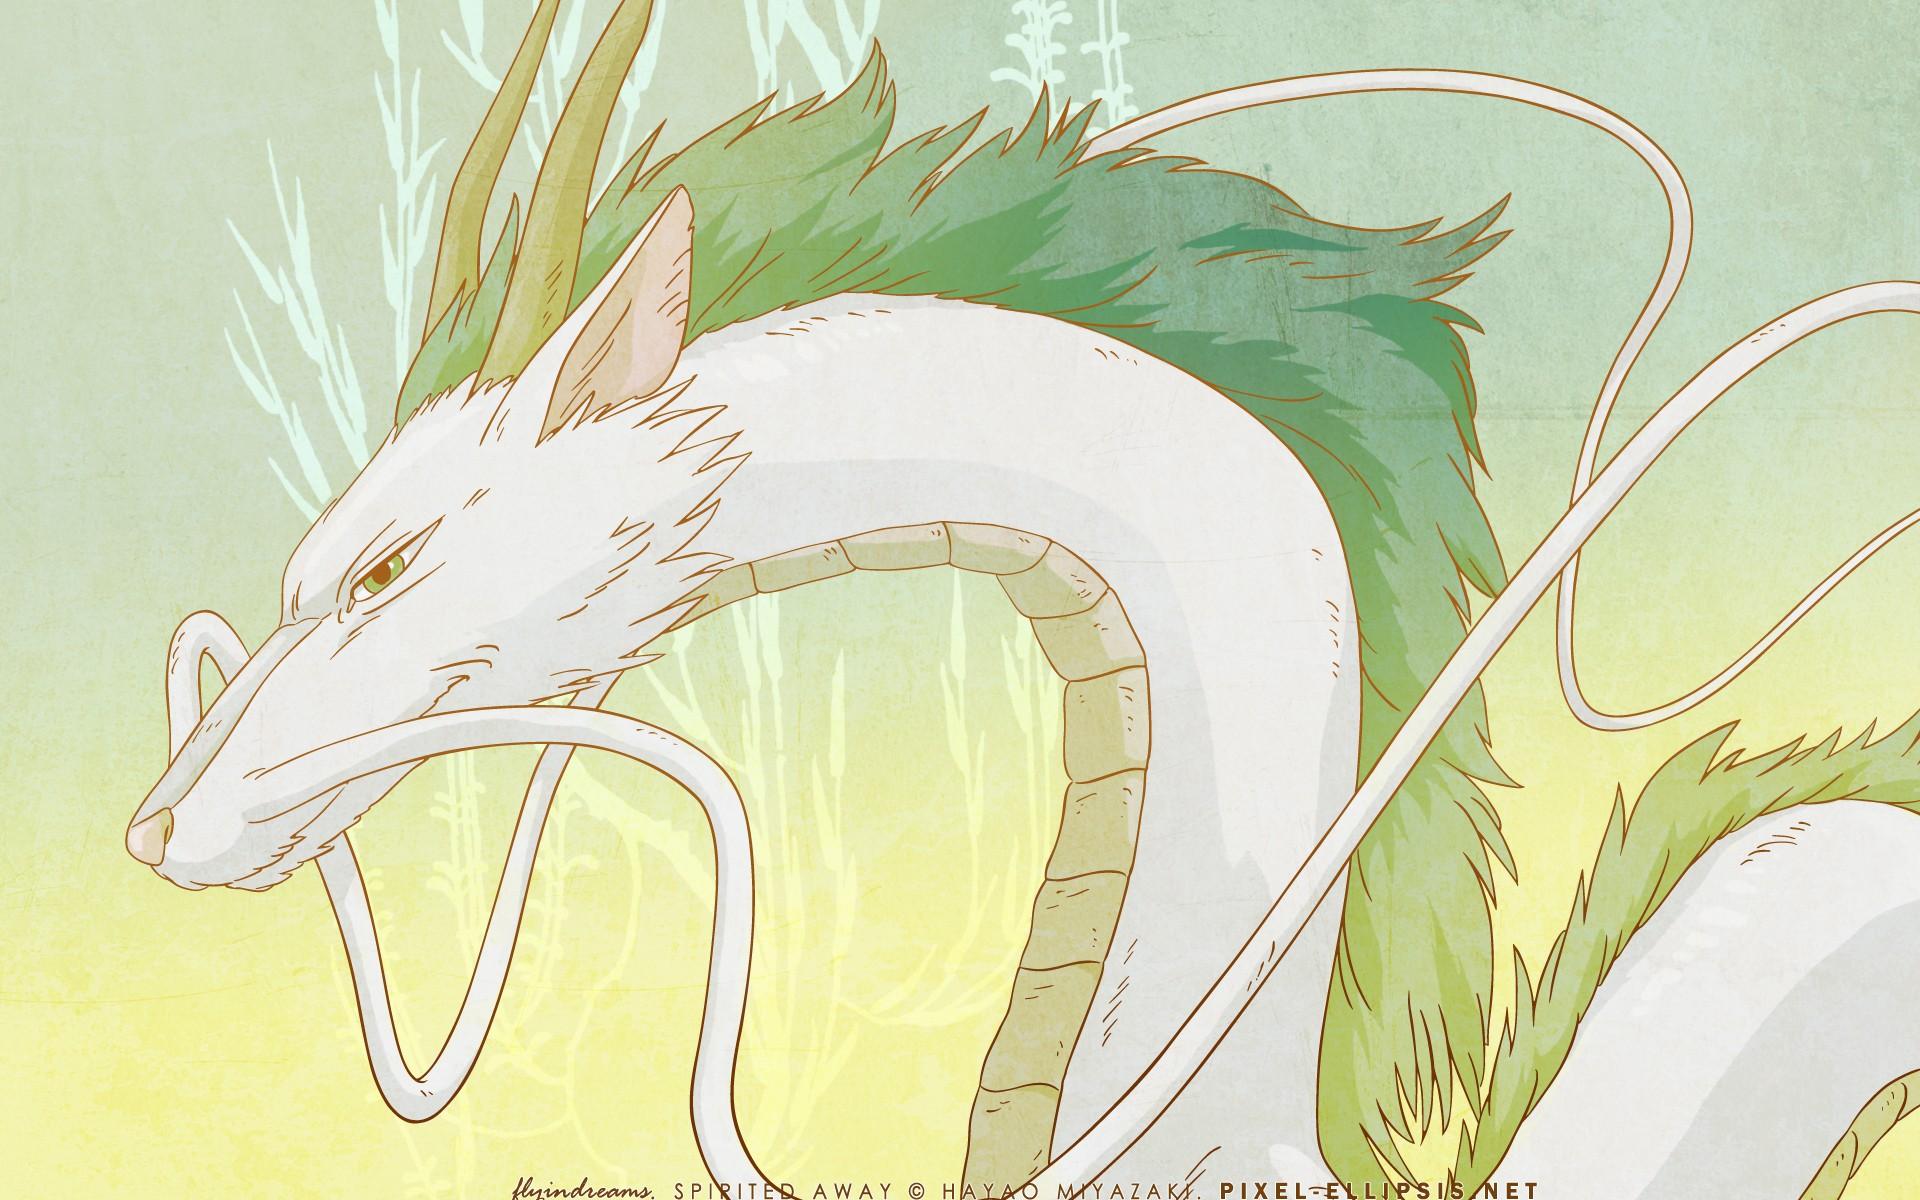 Wallpaper Drawing Illustration Anime Spirited Away Cartoon Dragon Studio Ghibli Wing Sketch Fictional Character 1920x1200 Poune 282976 Hd Wallpapers Wallhere